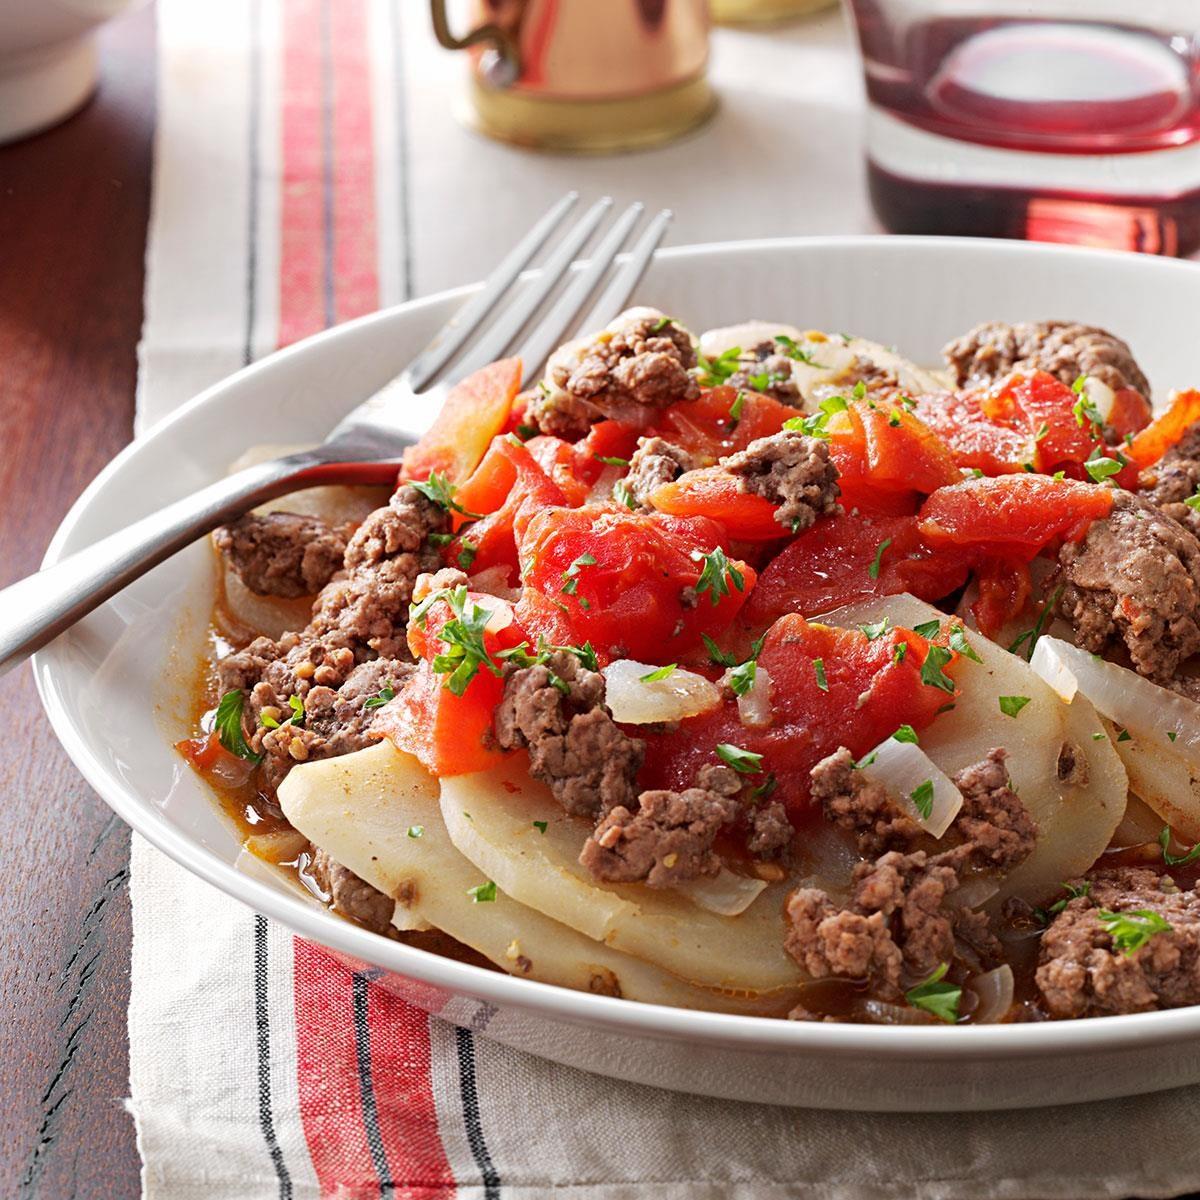 hamburger casserole beef recipes recipe taste food dish ground tasteofhome potato ingredients potatoes bake meat dishes cooking texas main easy